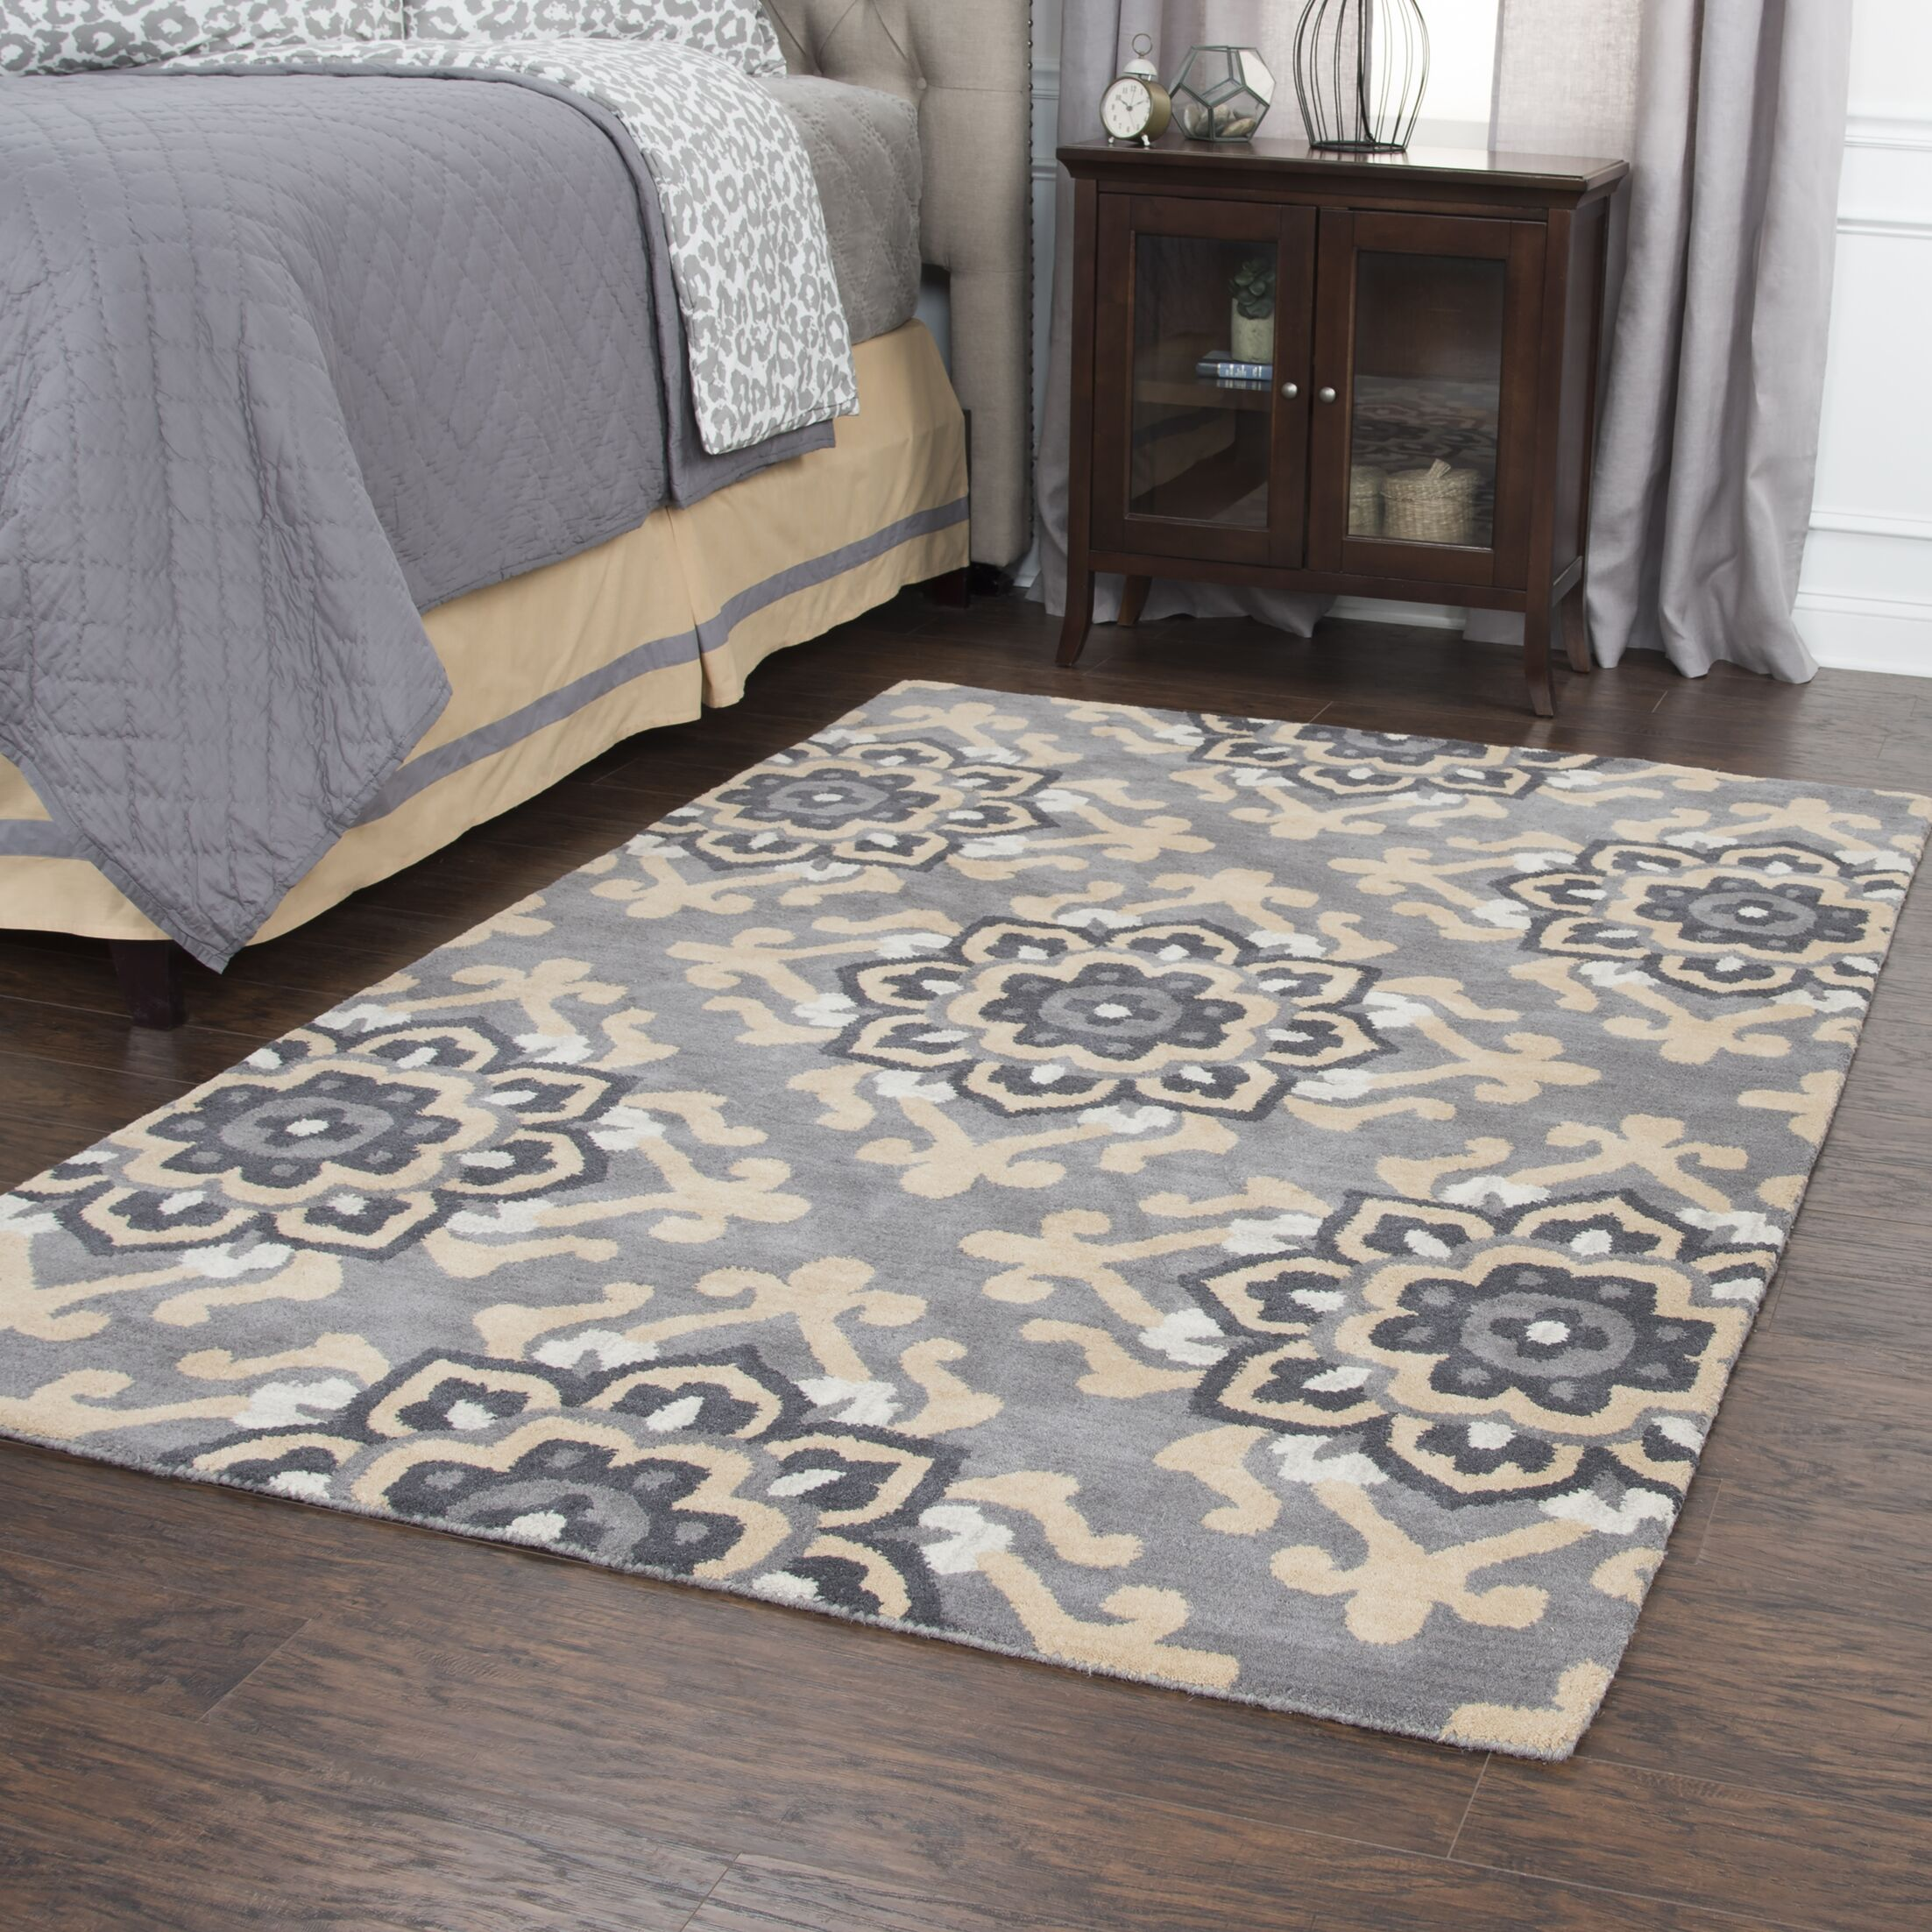 Raj Hand-Tufted Wool Gray Area Rug Rug Size: Rectangle 5' x 8'